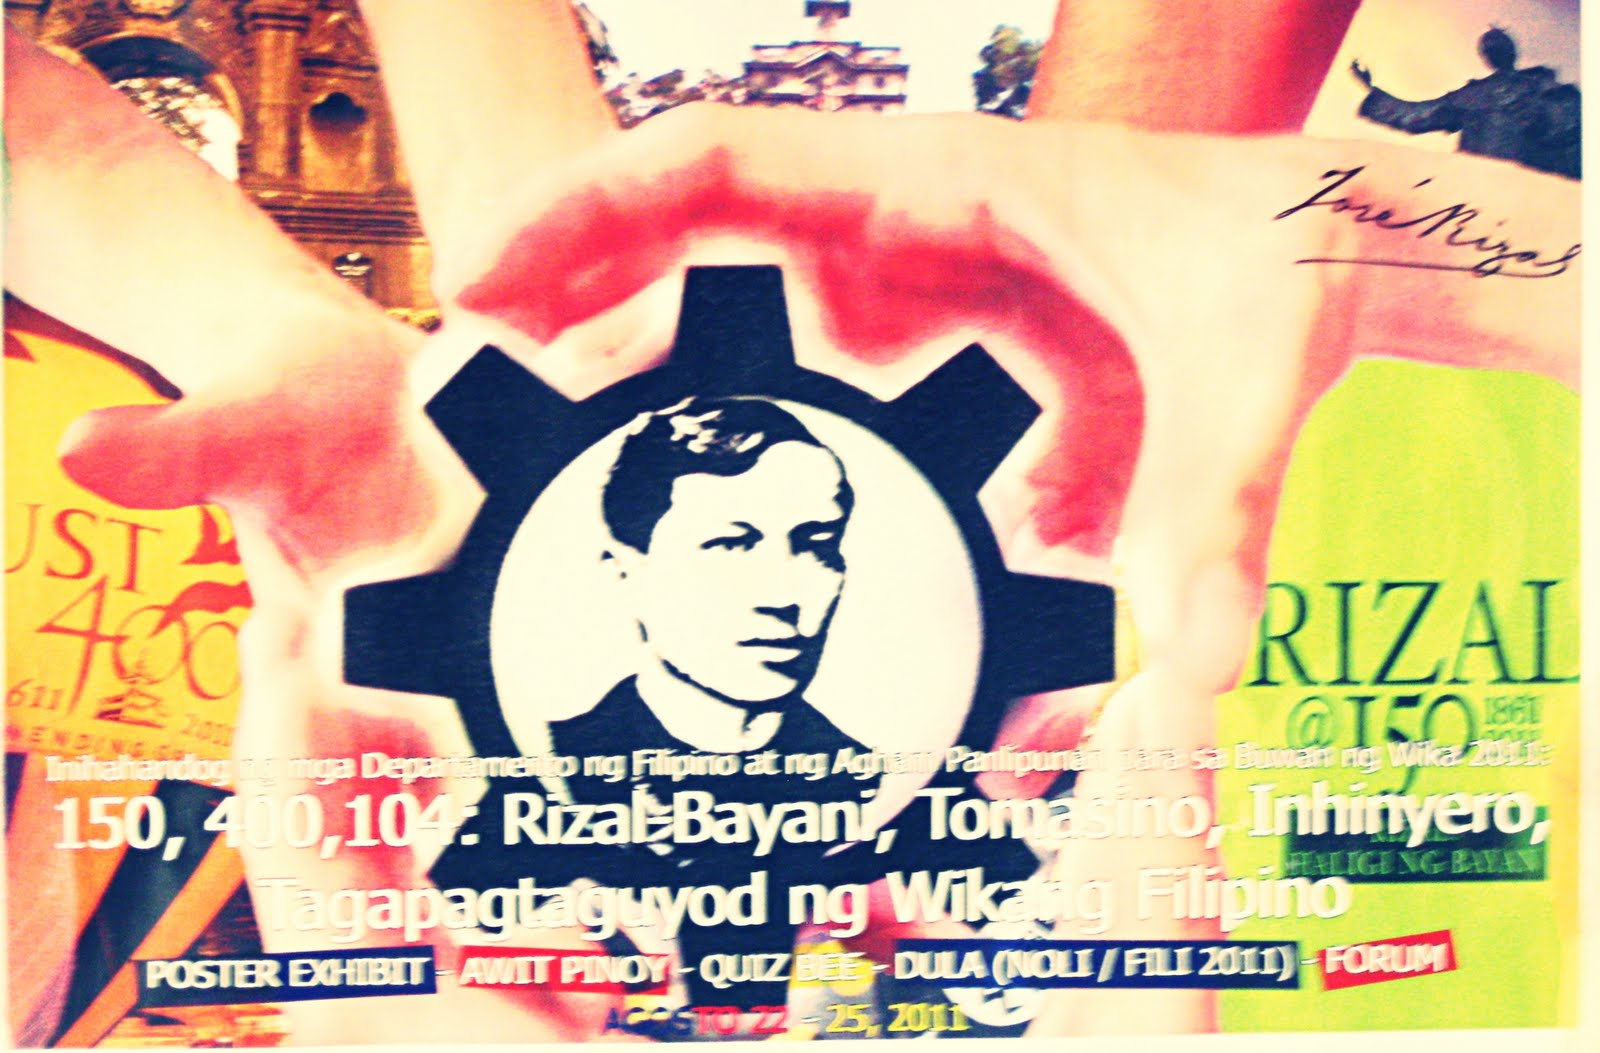 Sino nga ba Ako? (Filipino Essay on Mahalaga pa ba si Jose Rizal?)